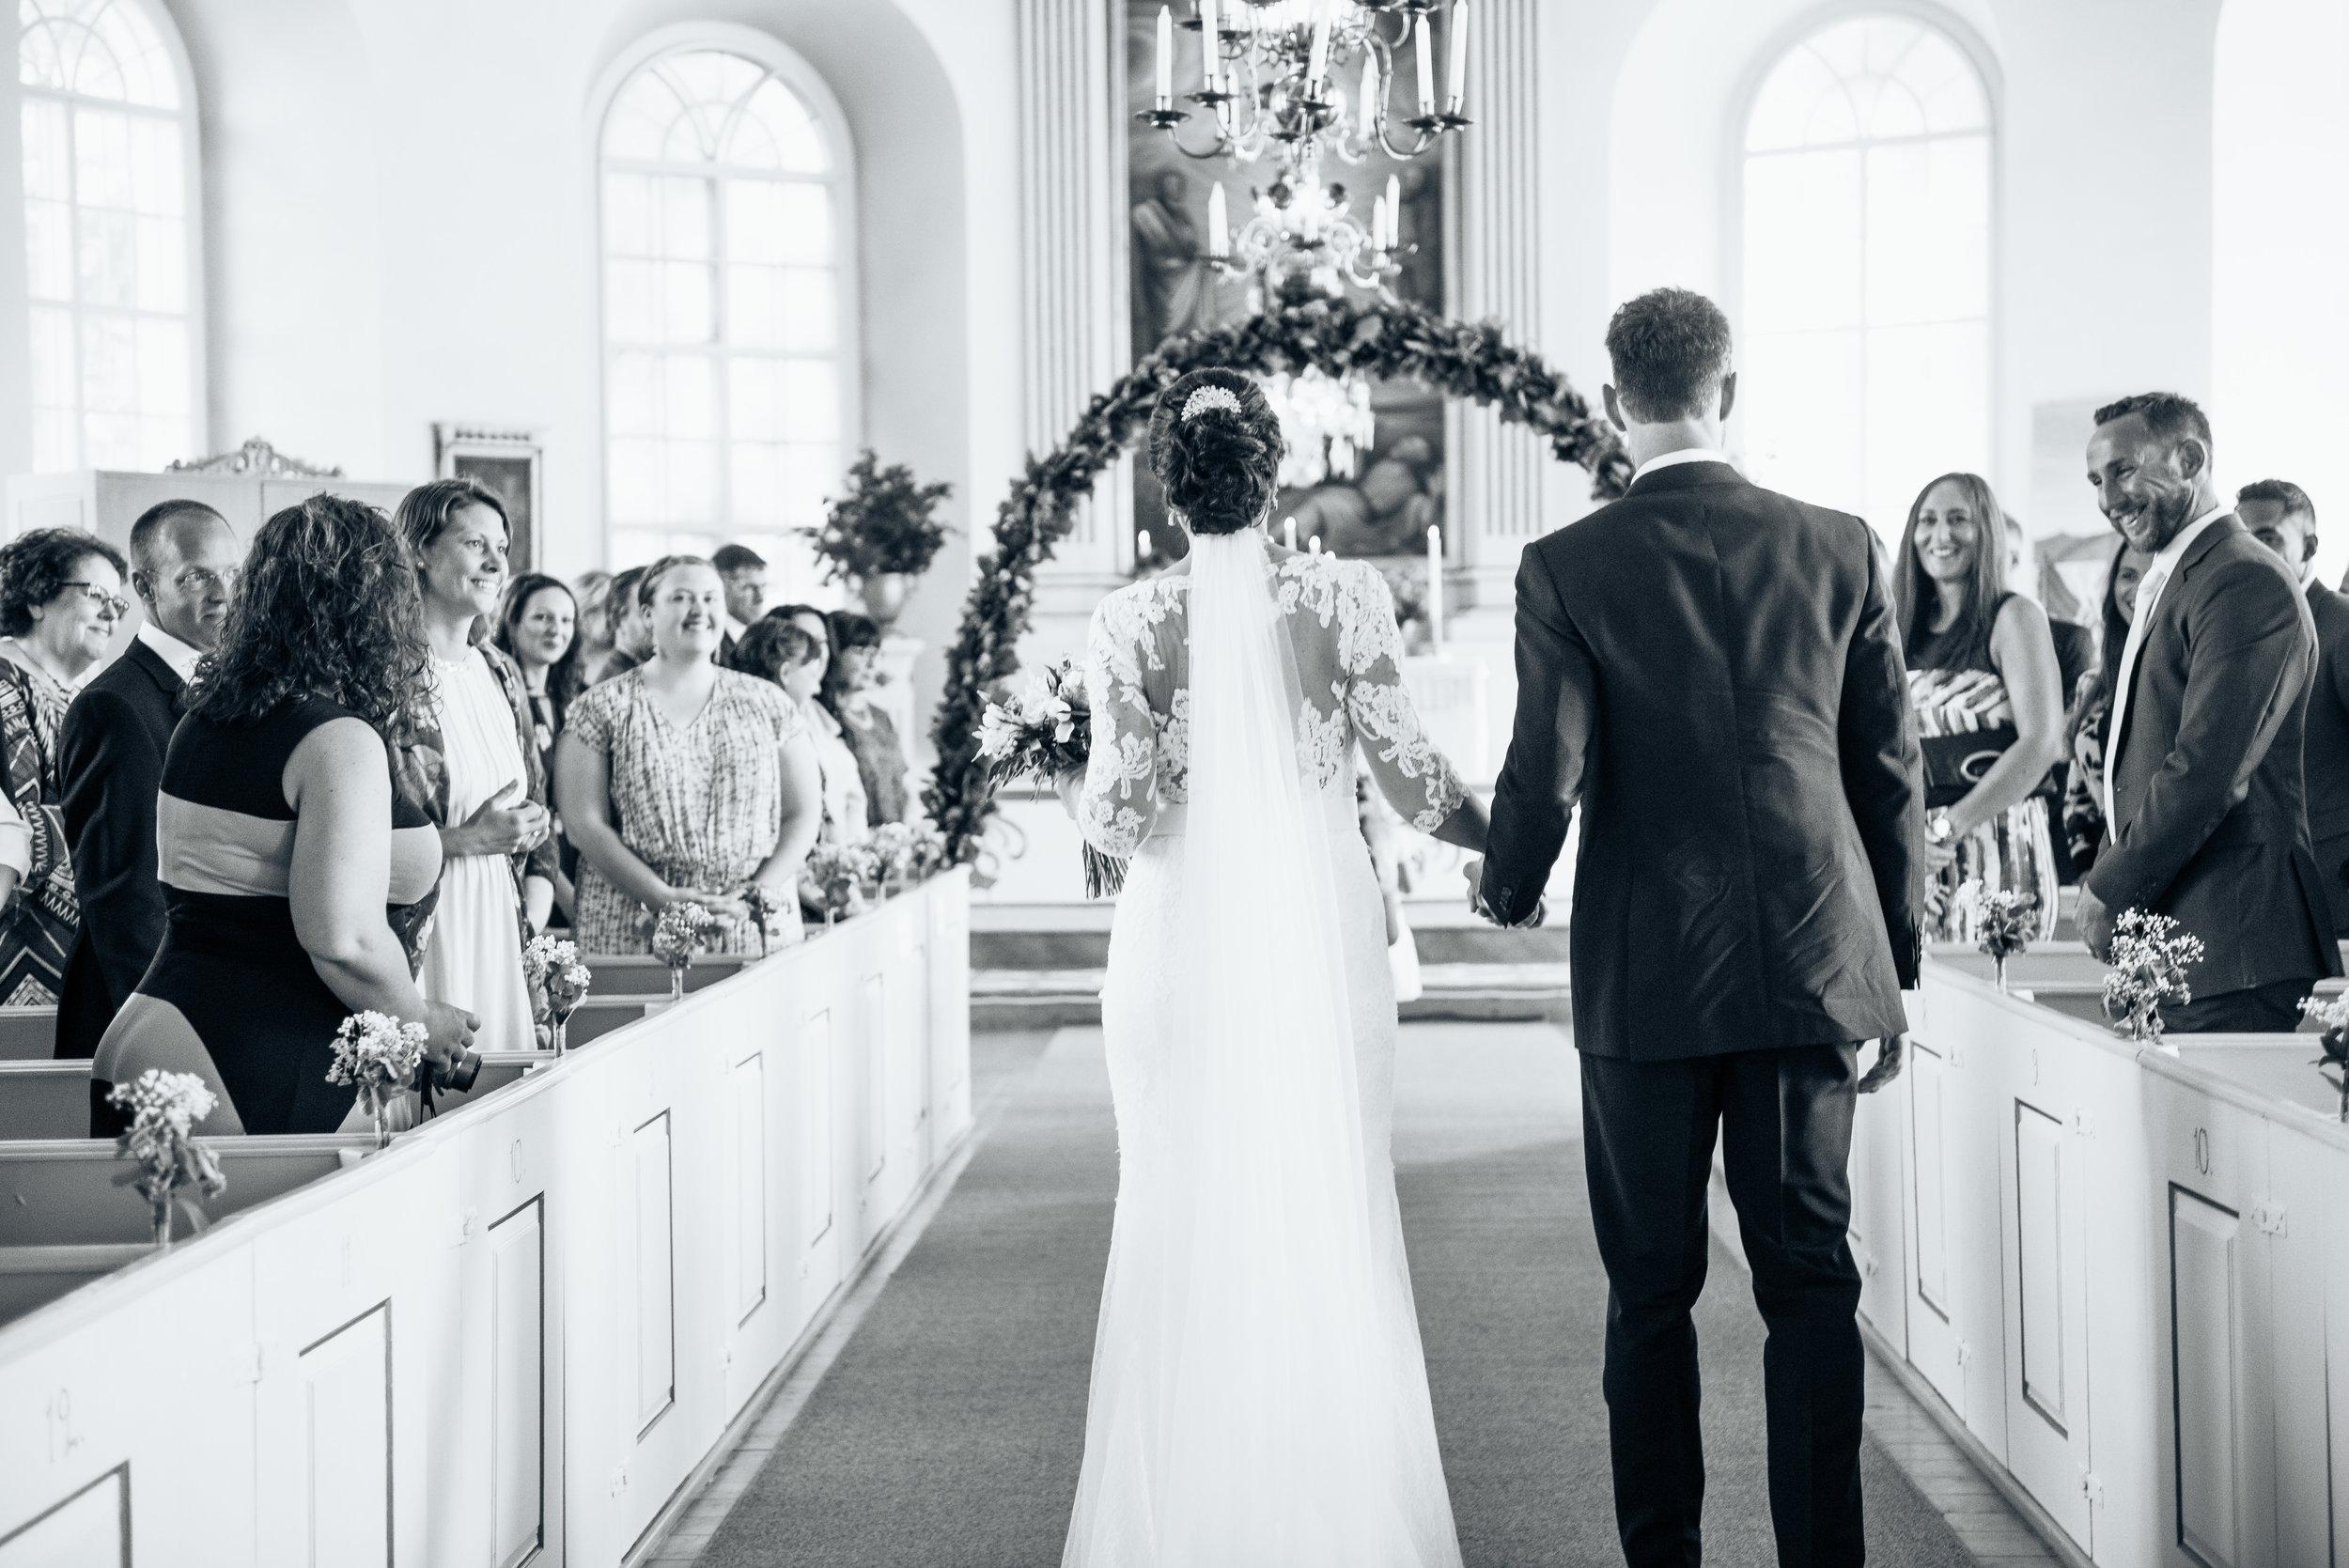 wedding_hanna&ben_046.jpg